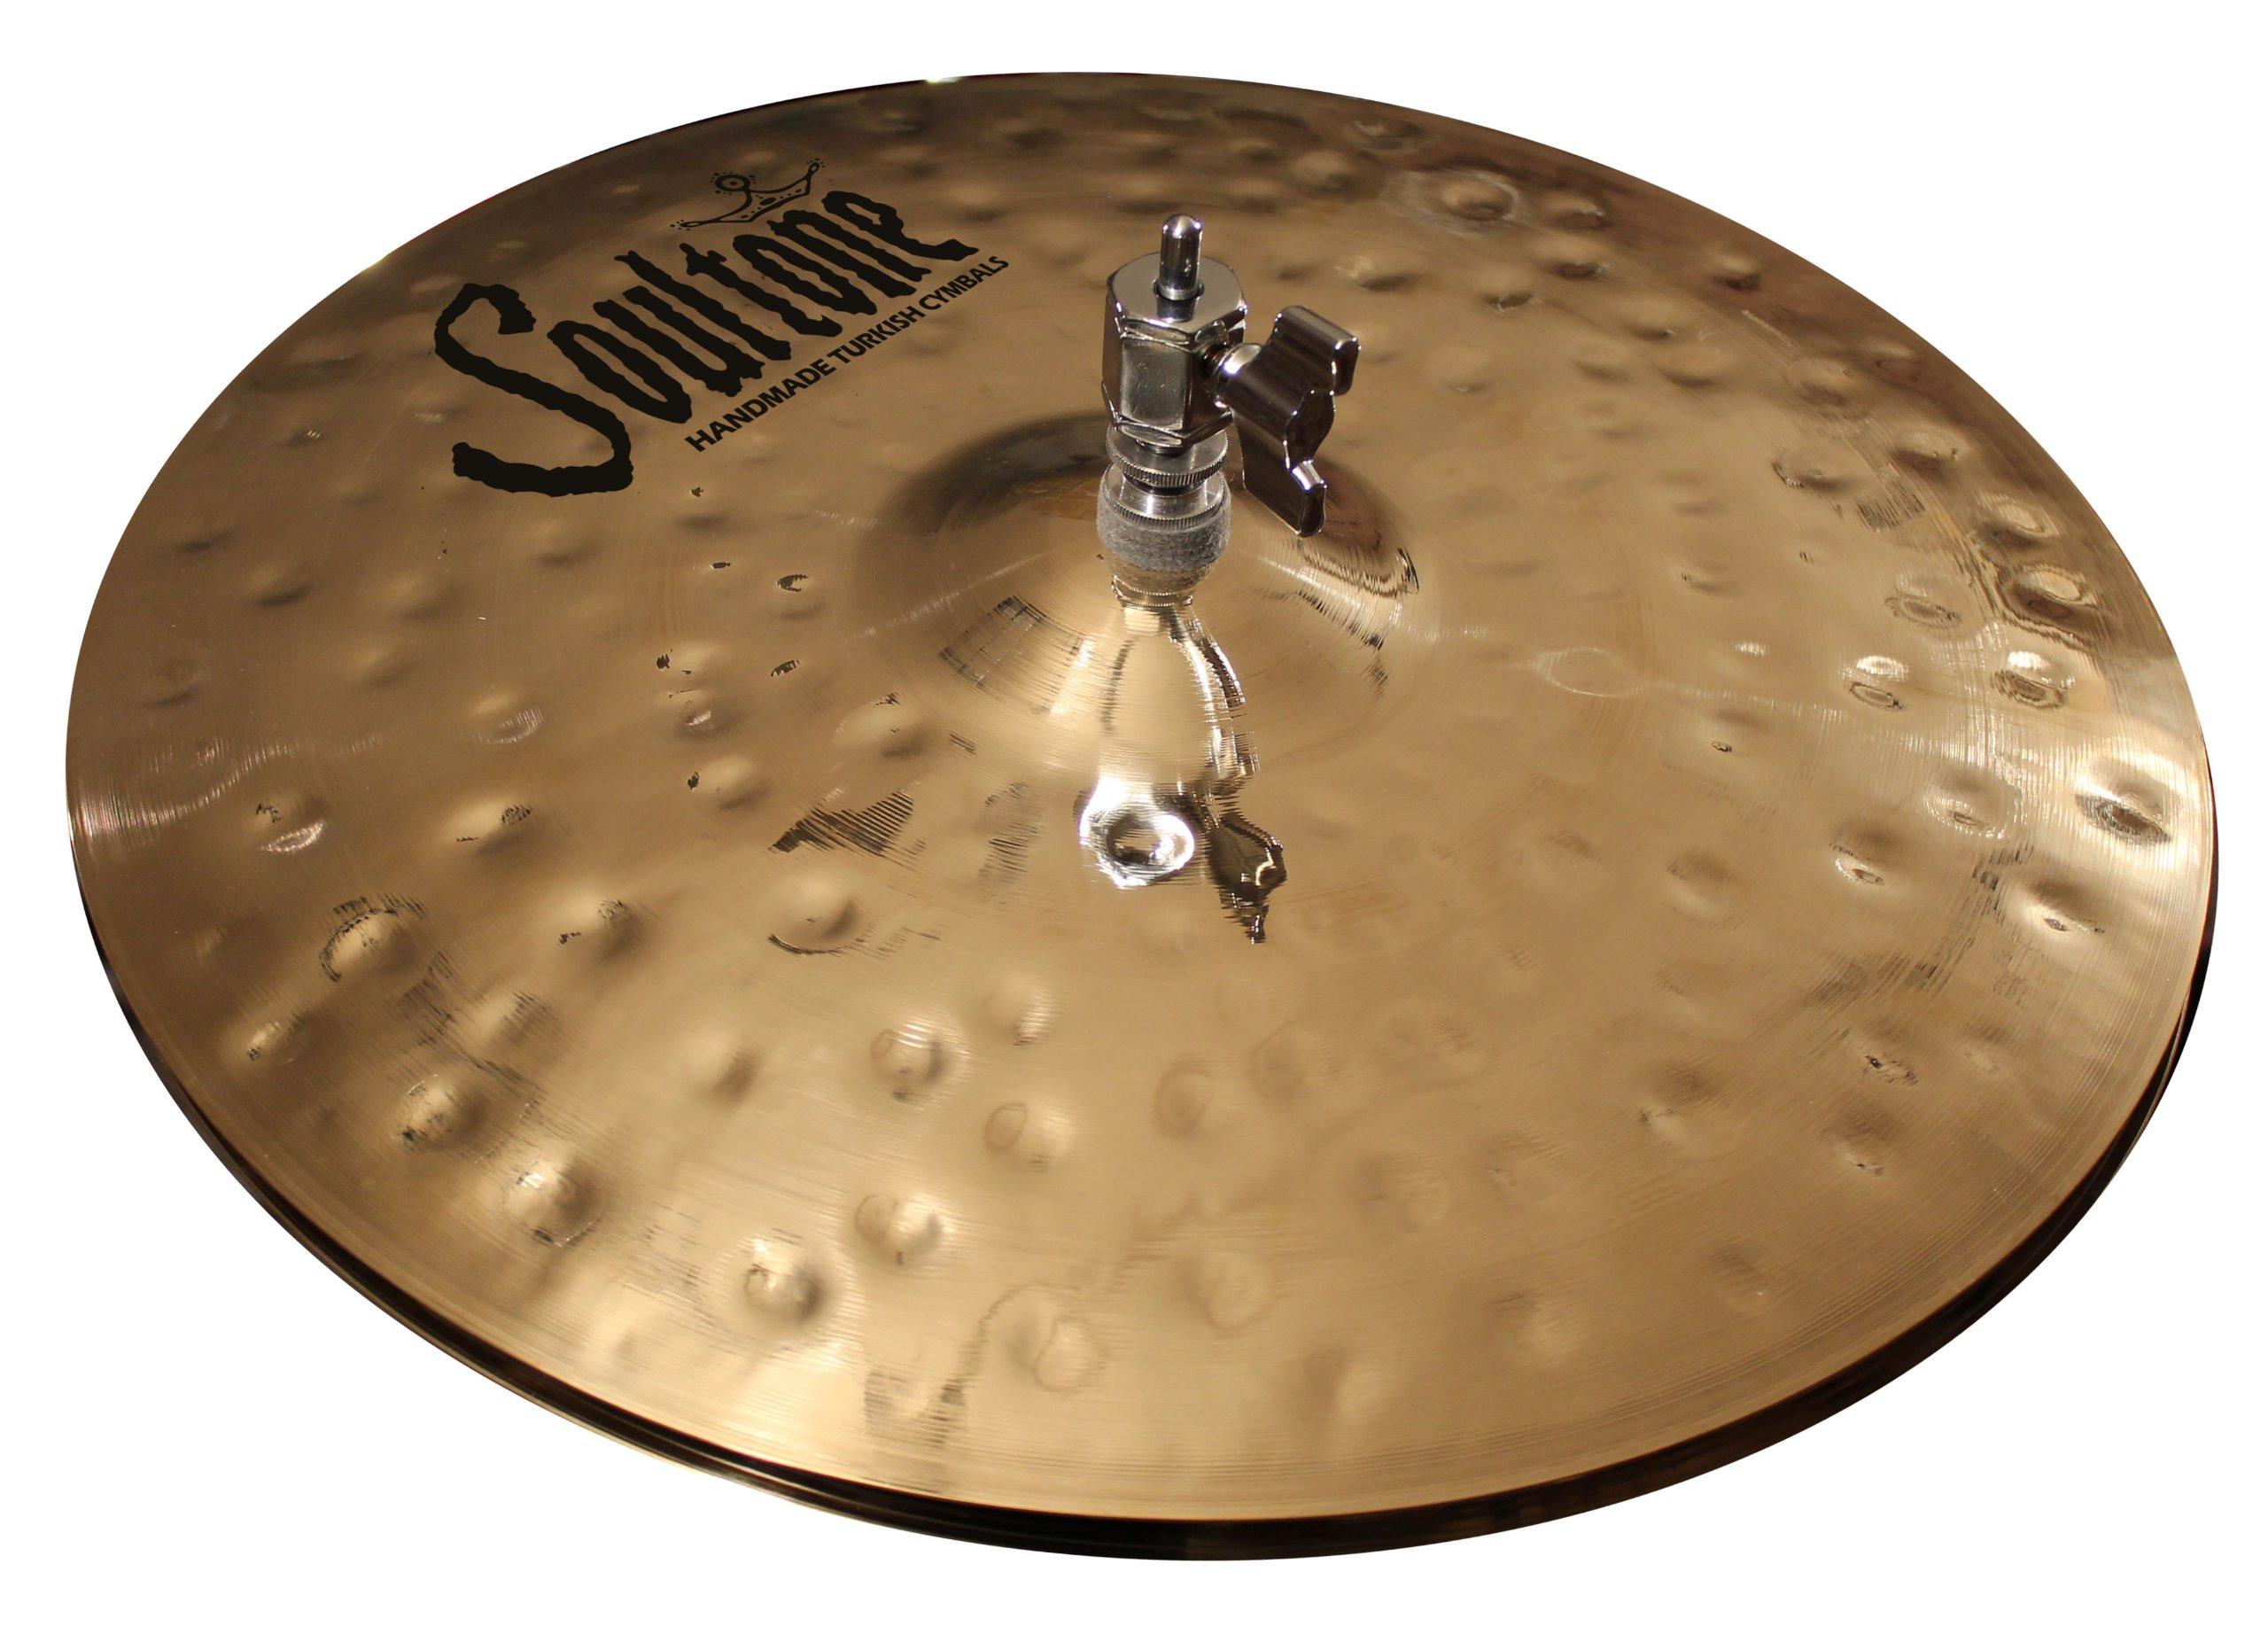 Soultone Cymbals HVHMR-HHTT14-14'' Heavy Hammered Hi Hat Top Only